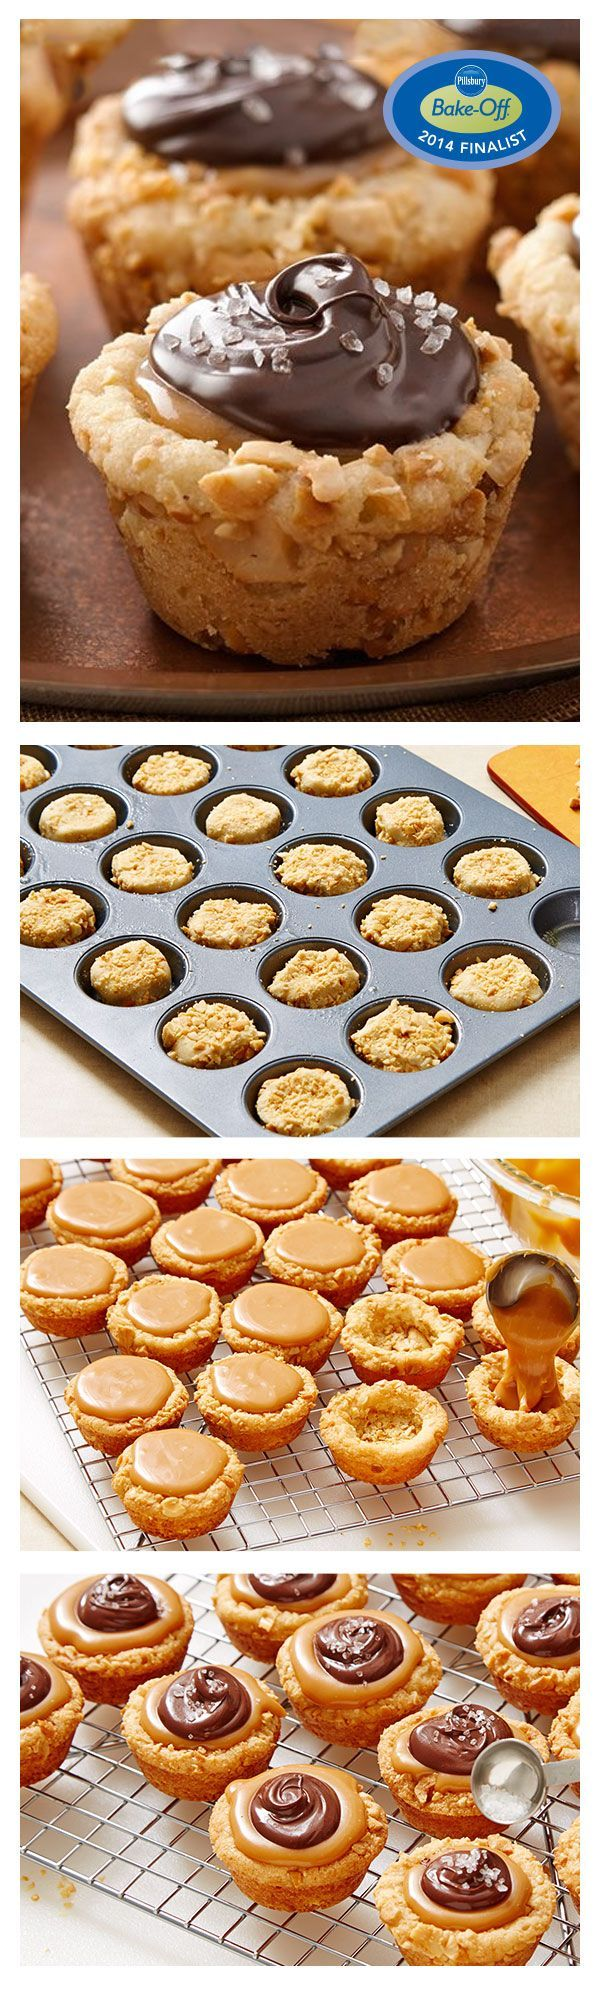 Salted Caramel-Cashew Cookie Tarts | » Food Ideas « | Pinterest